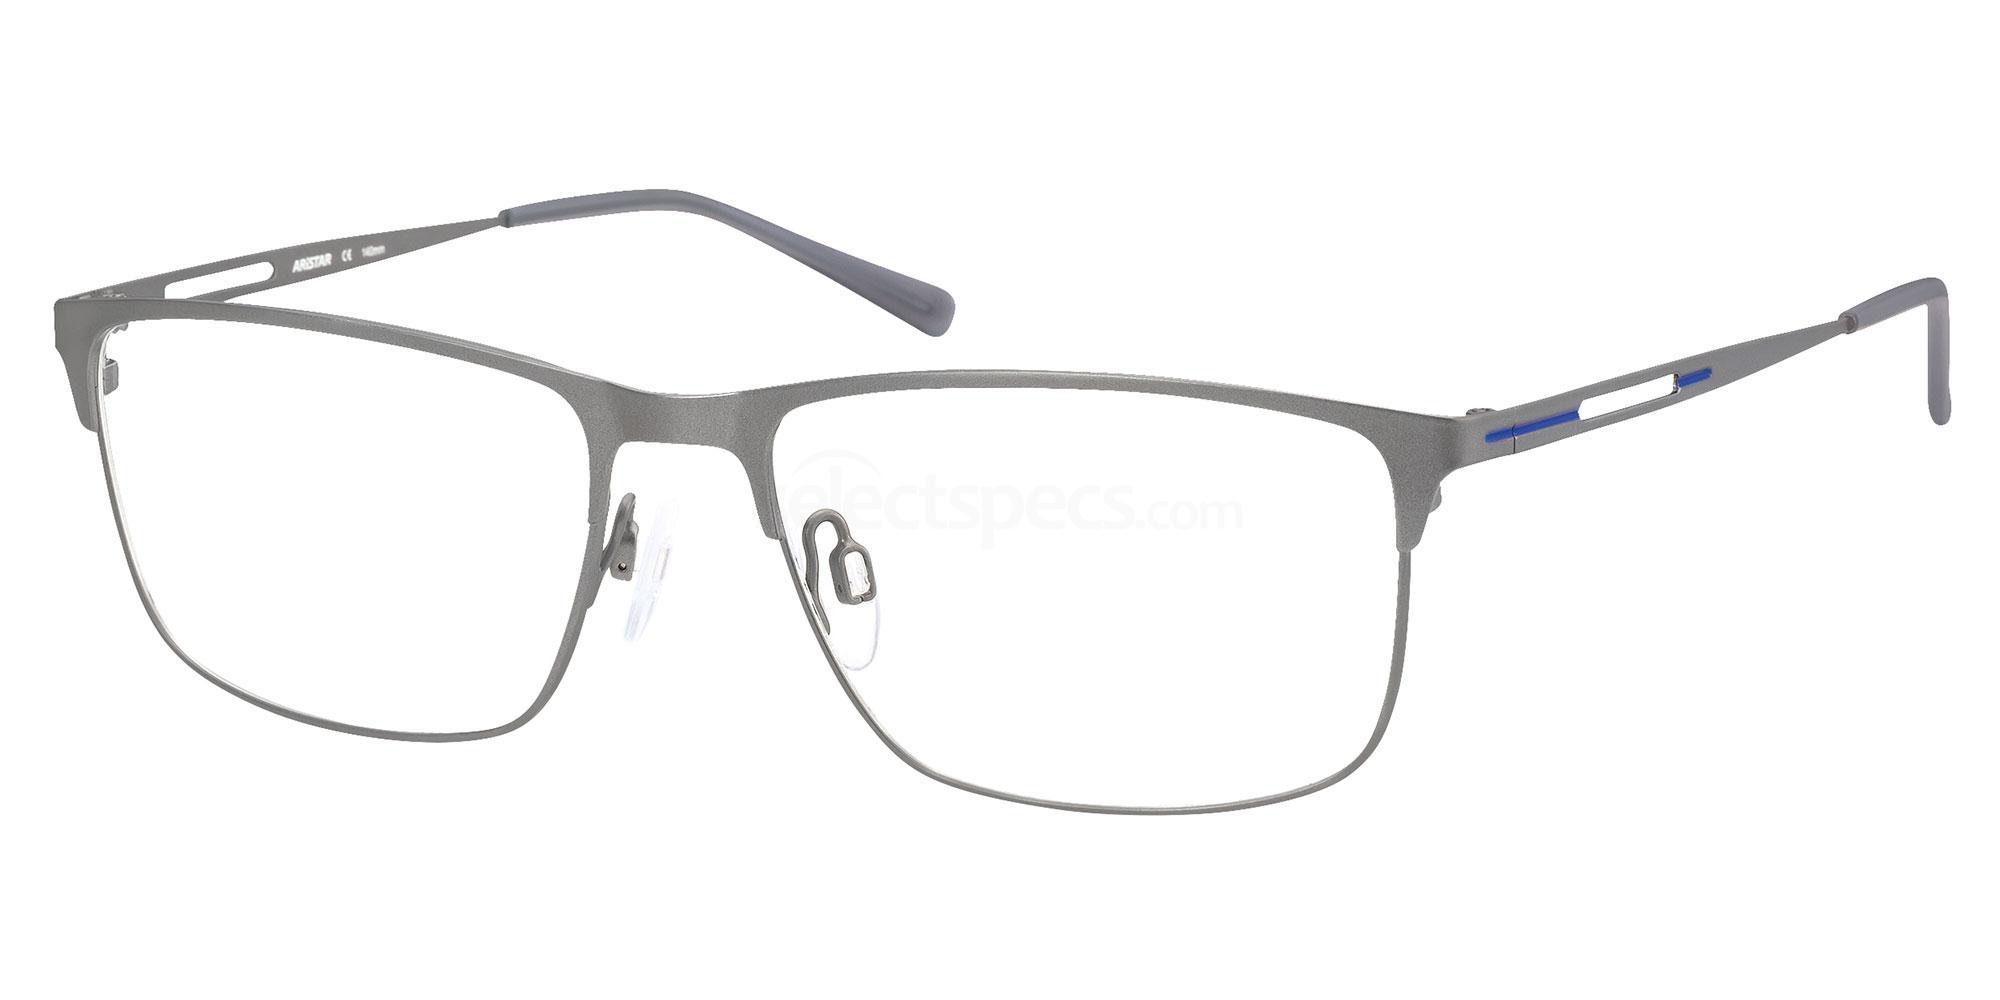 505 AR16261 Glasses, Aristar